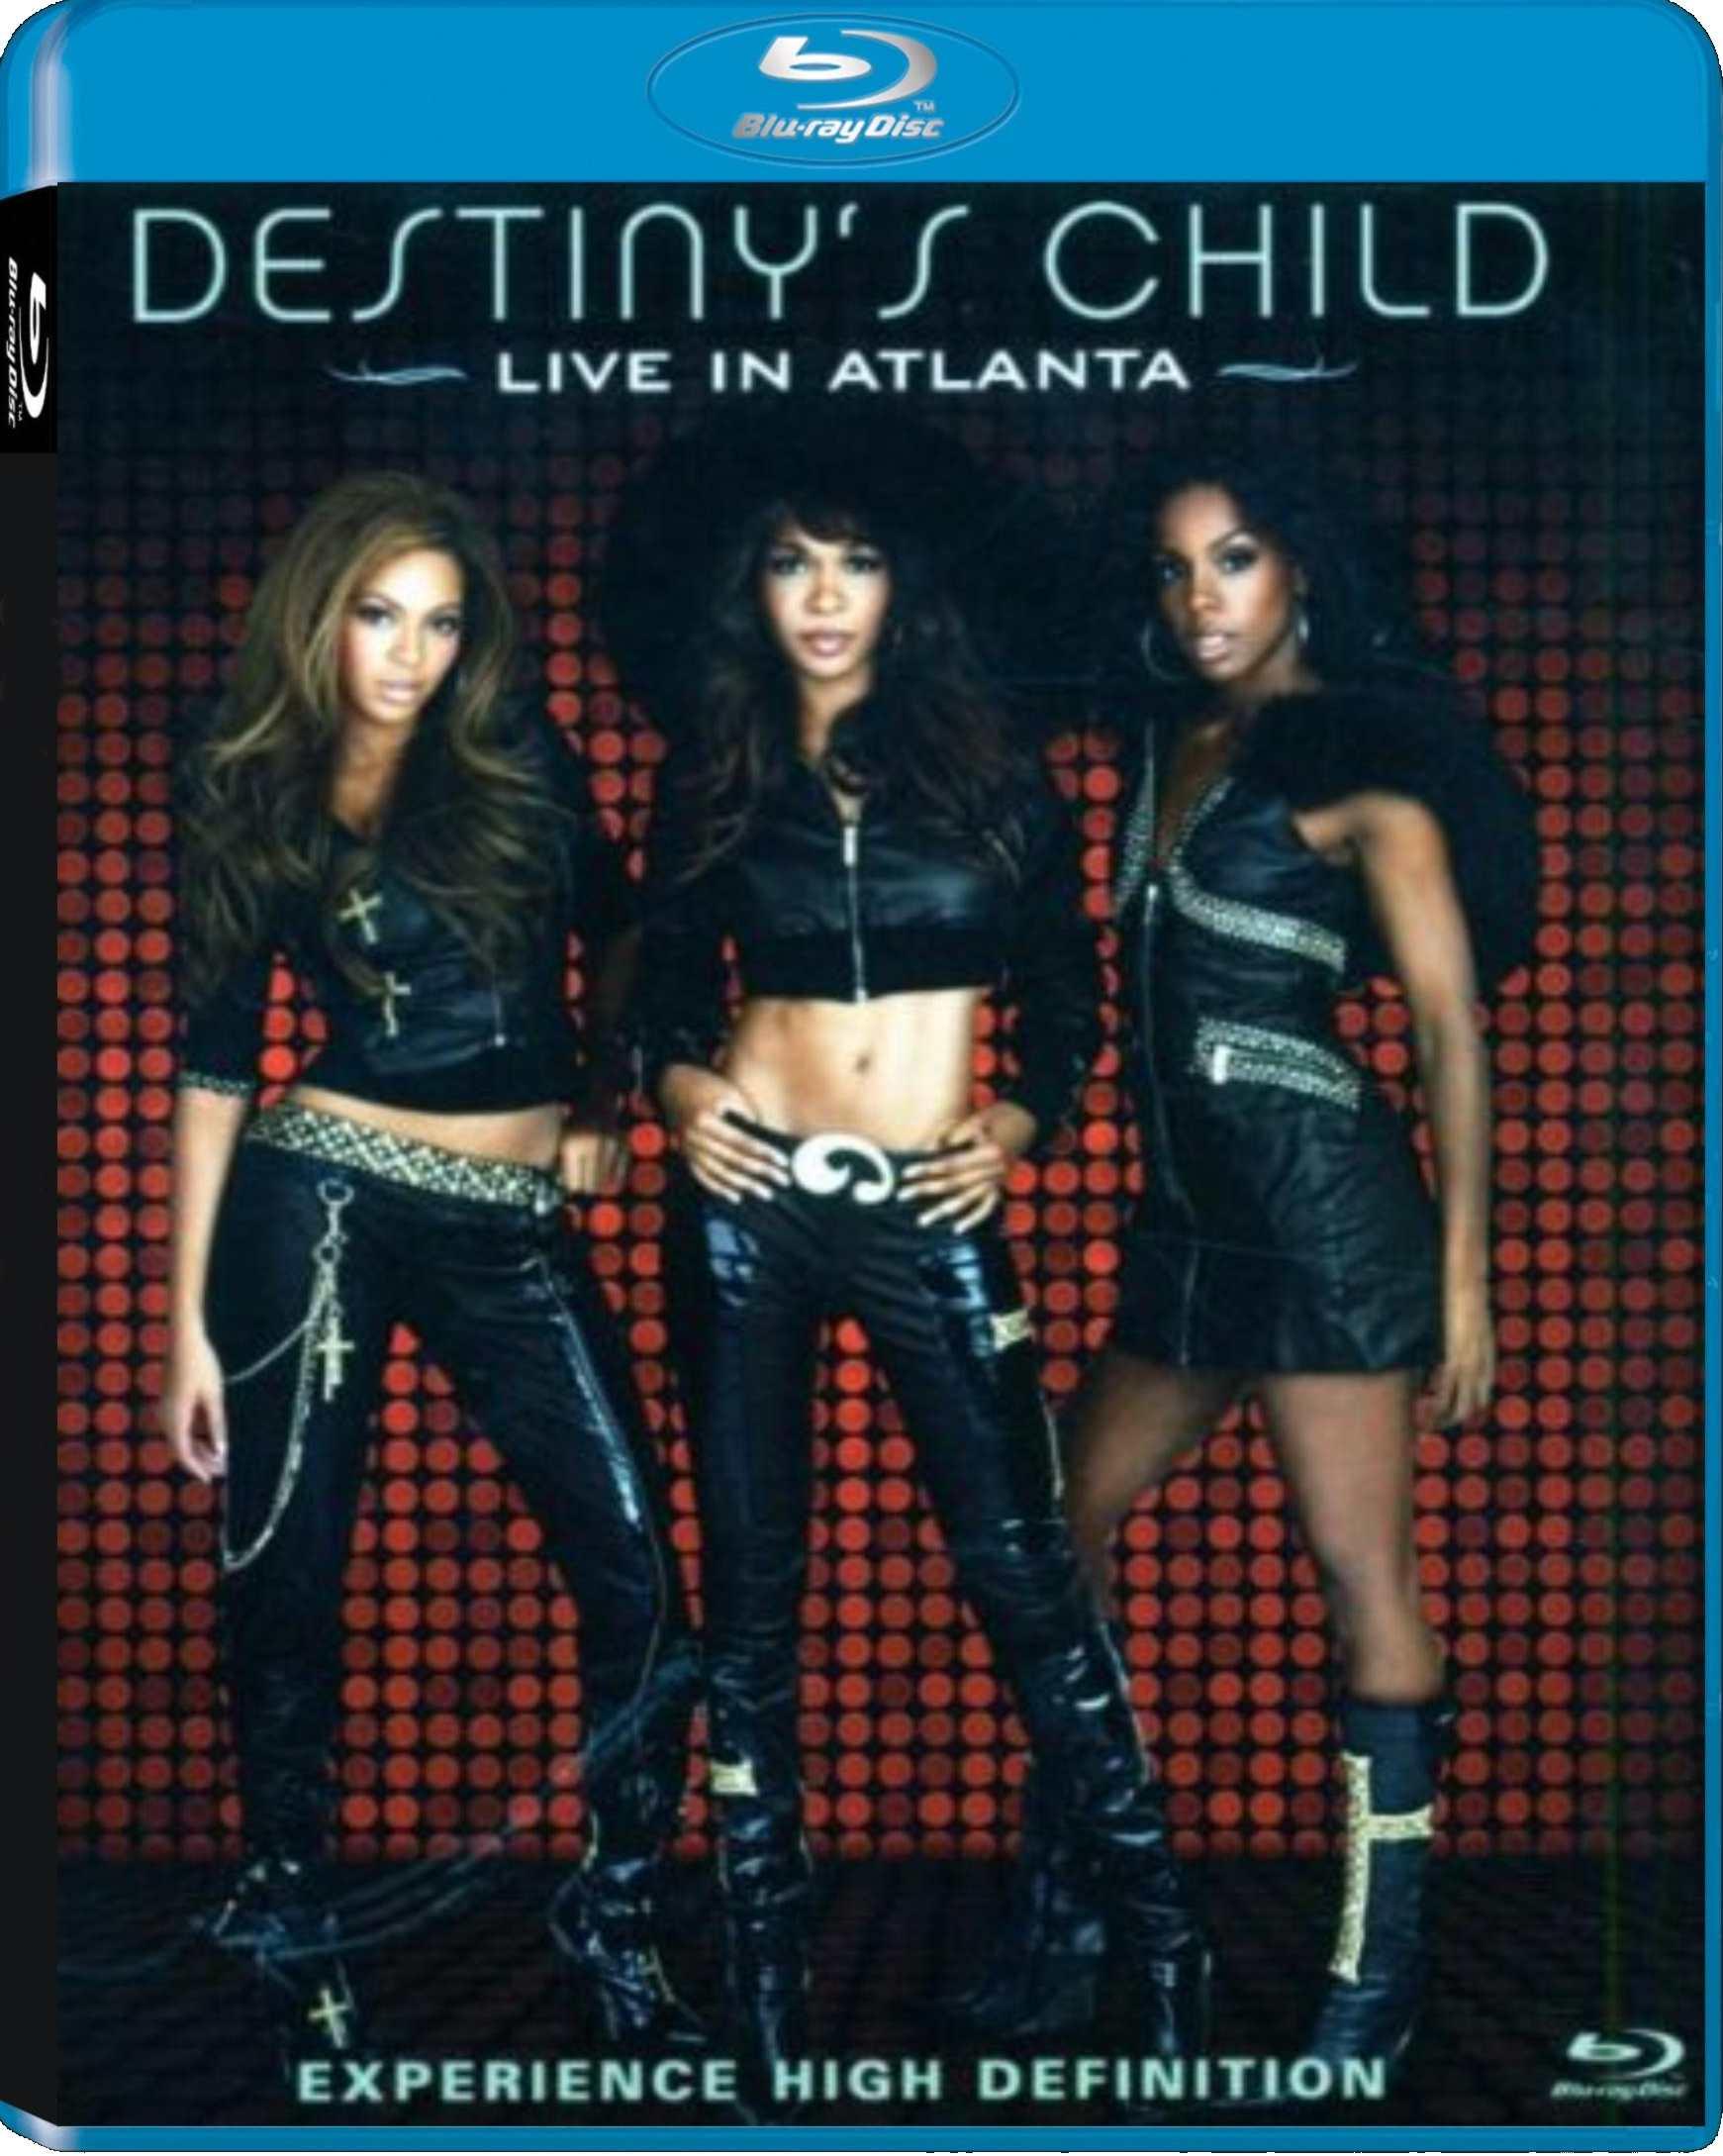 DESTINYS CHILD: LIVE IN ATLANTA - Blu-ray